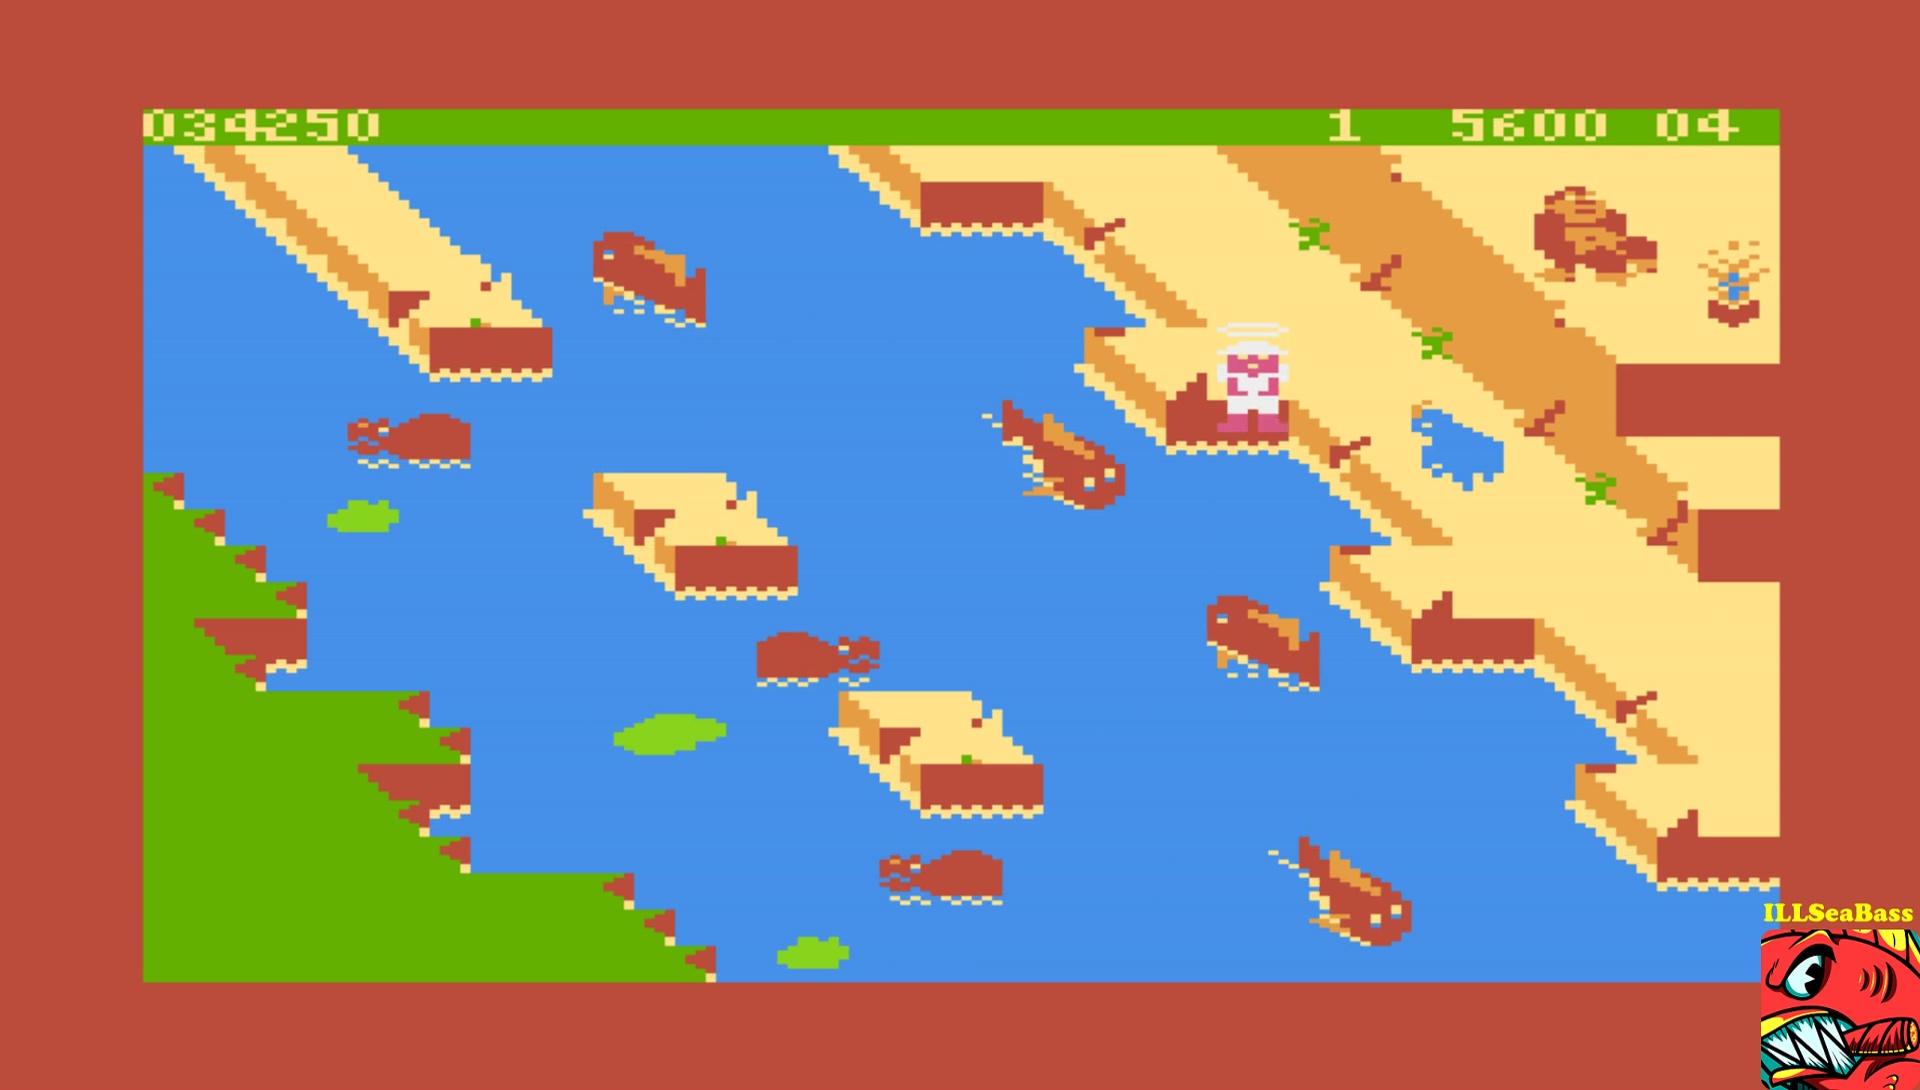 ILLSeaBass: Congo Bongo (Atari 400/800/XL/XE Emulated) 34,250 points on 2017-03-05 11:20:38